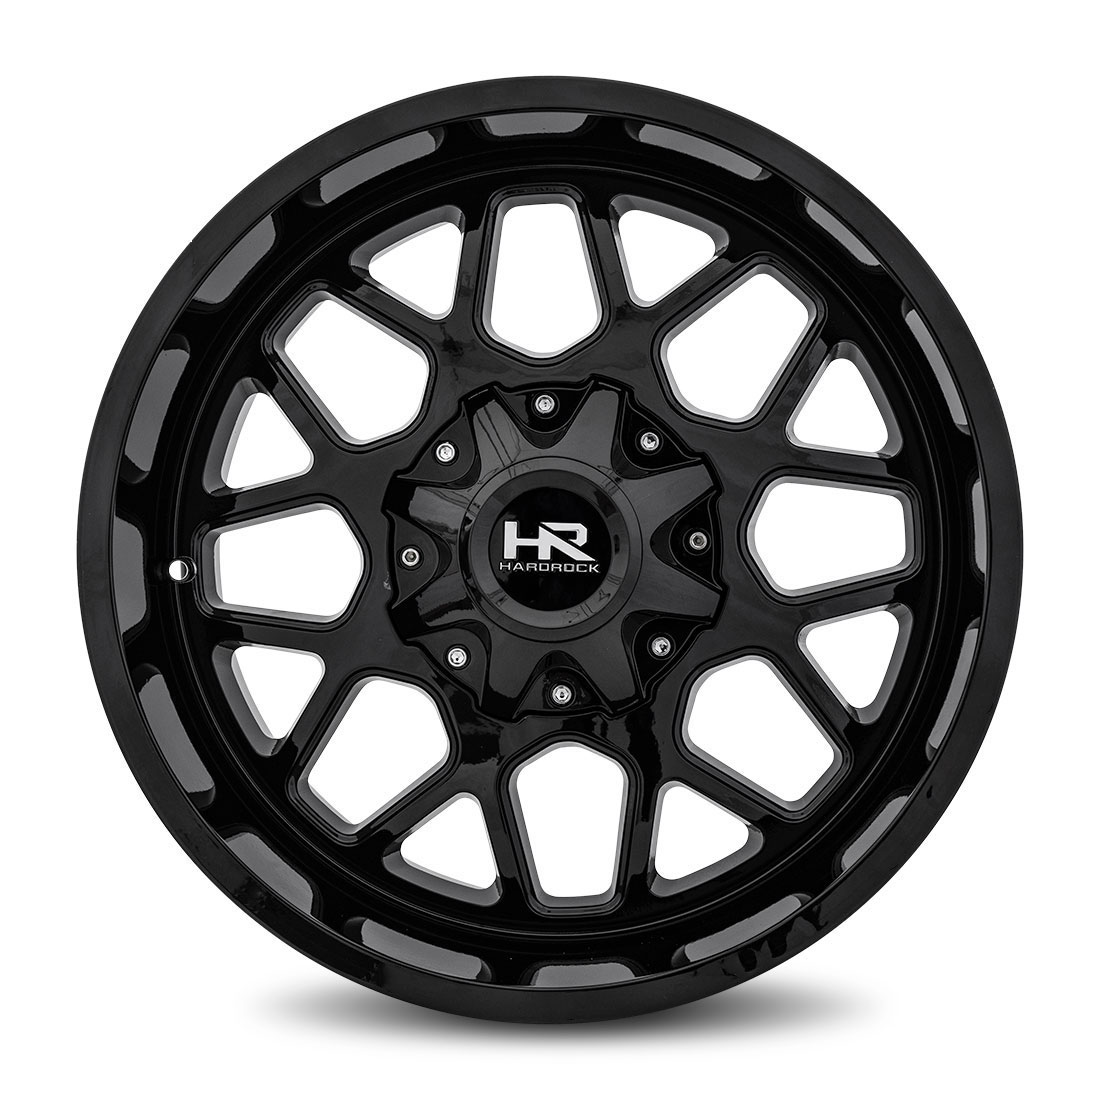 Hardrock Offroad Wheels H705 Gunner - Gloss Black - 20x10